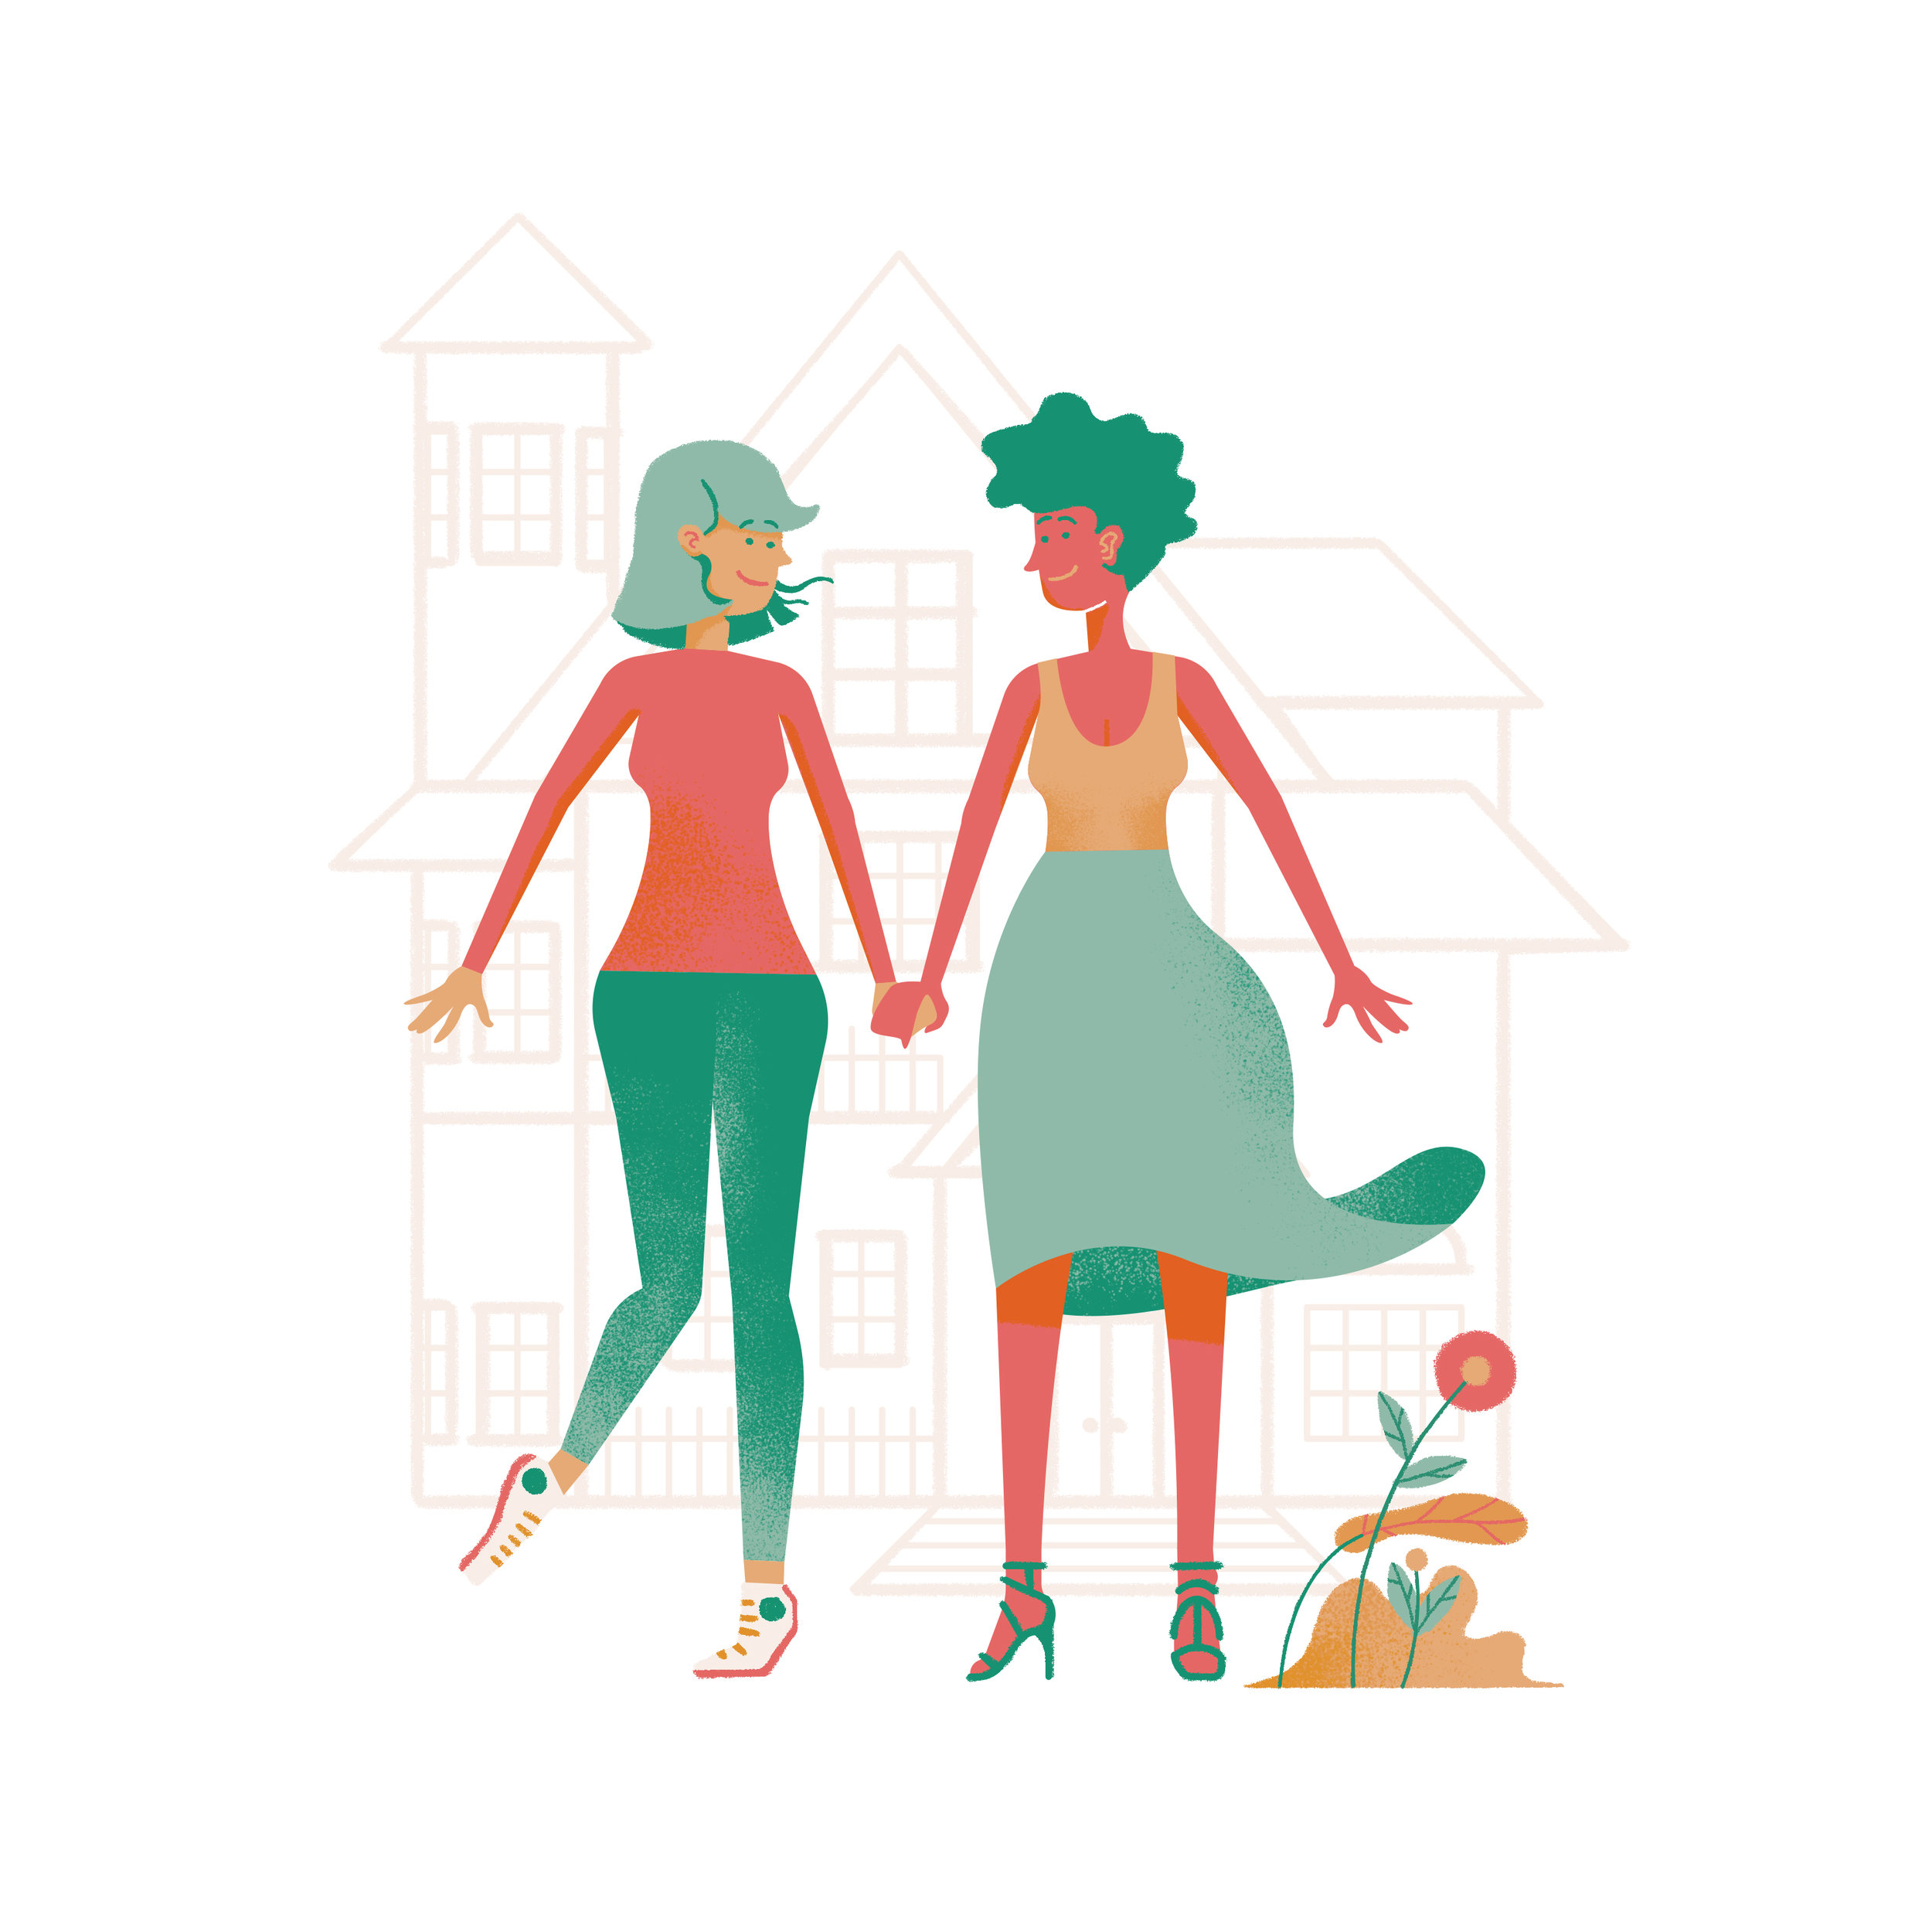 HOU-170821_LOVE_DATING_Lesbian-Couple-01.jpg